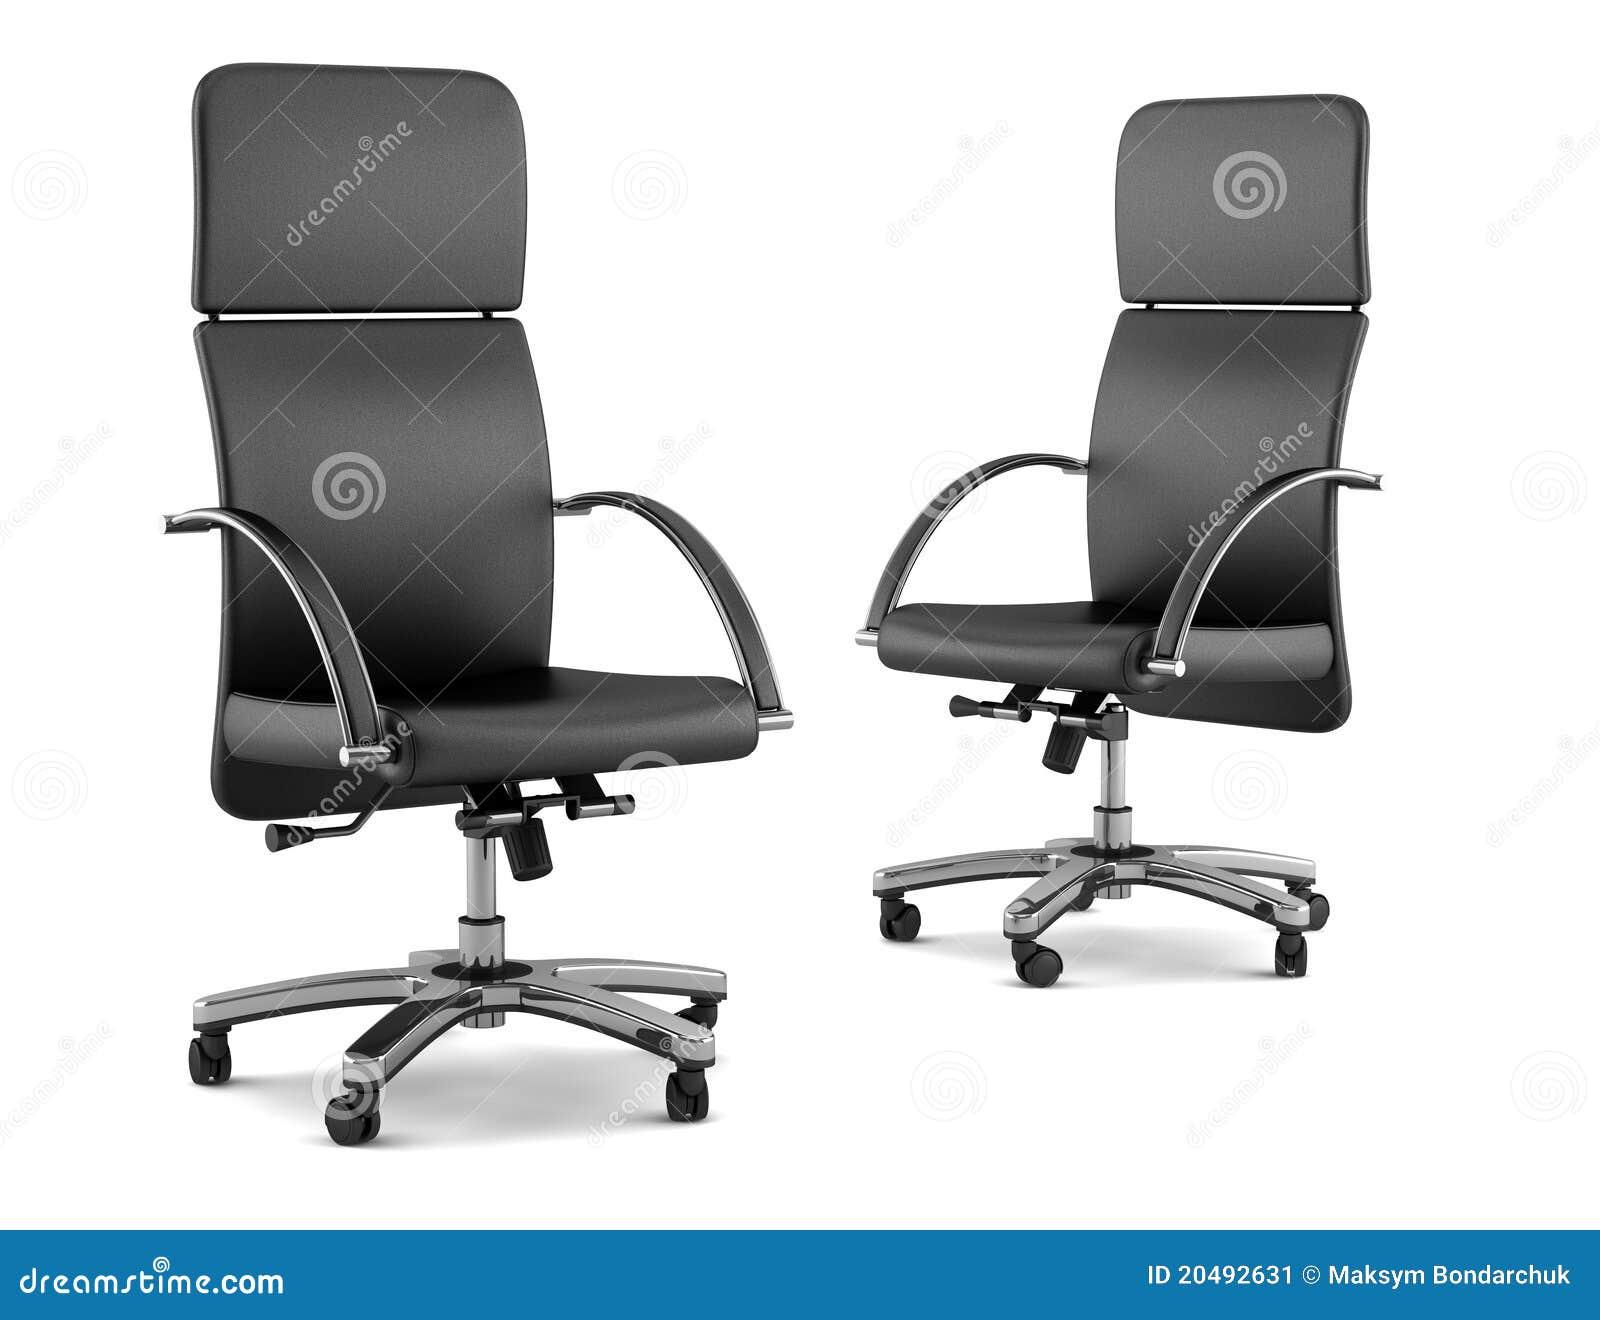 Dos sillas negras modernas de la oficina en blanco stock for Xxx porno en la oficina